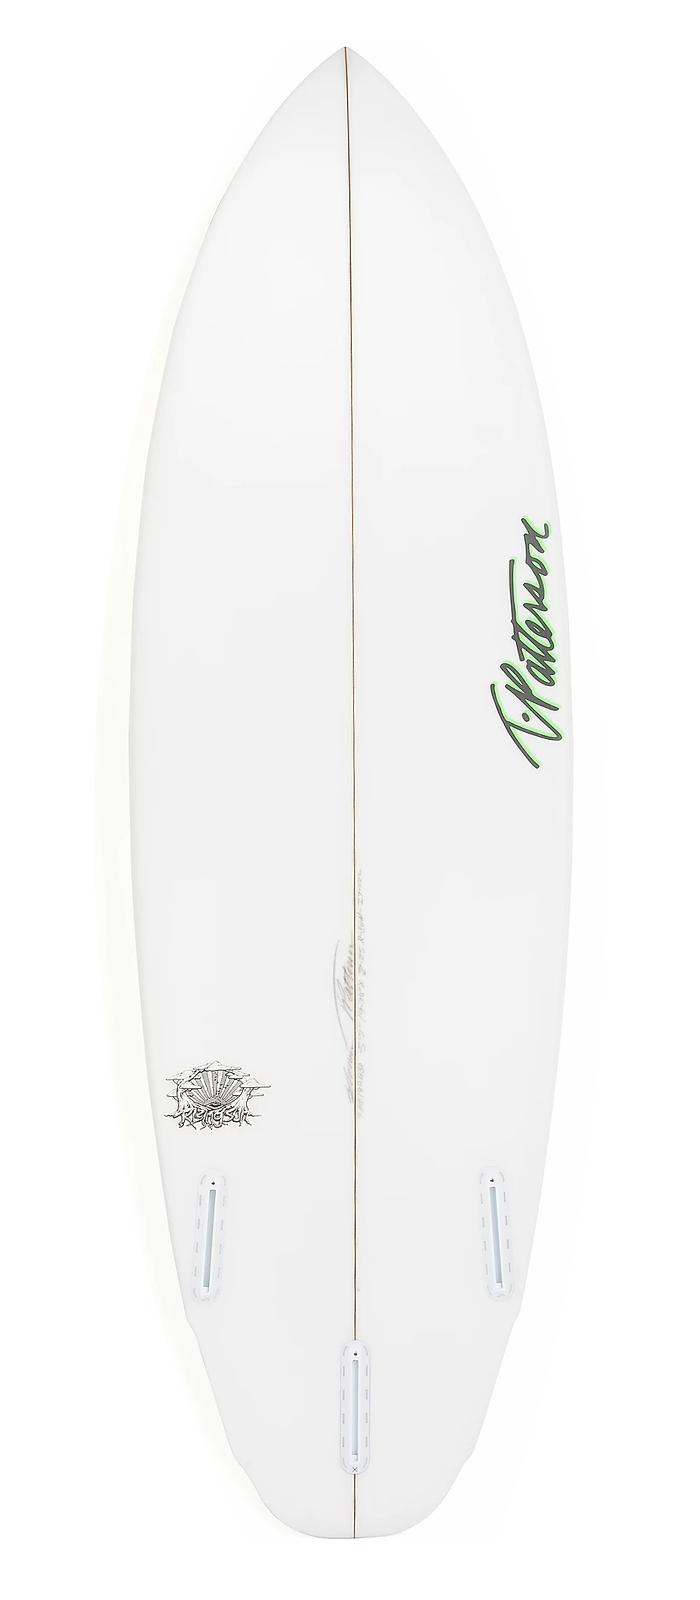 RISING SUN surfboard model bottom